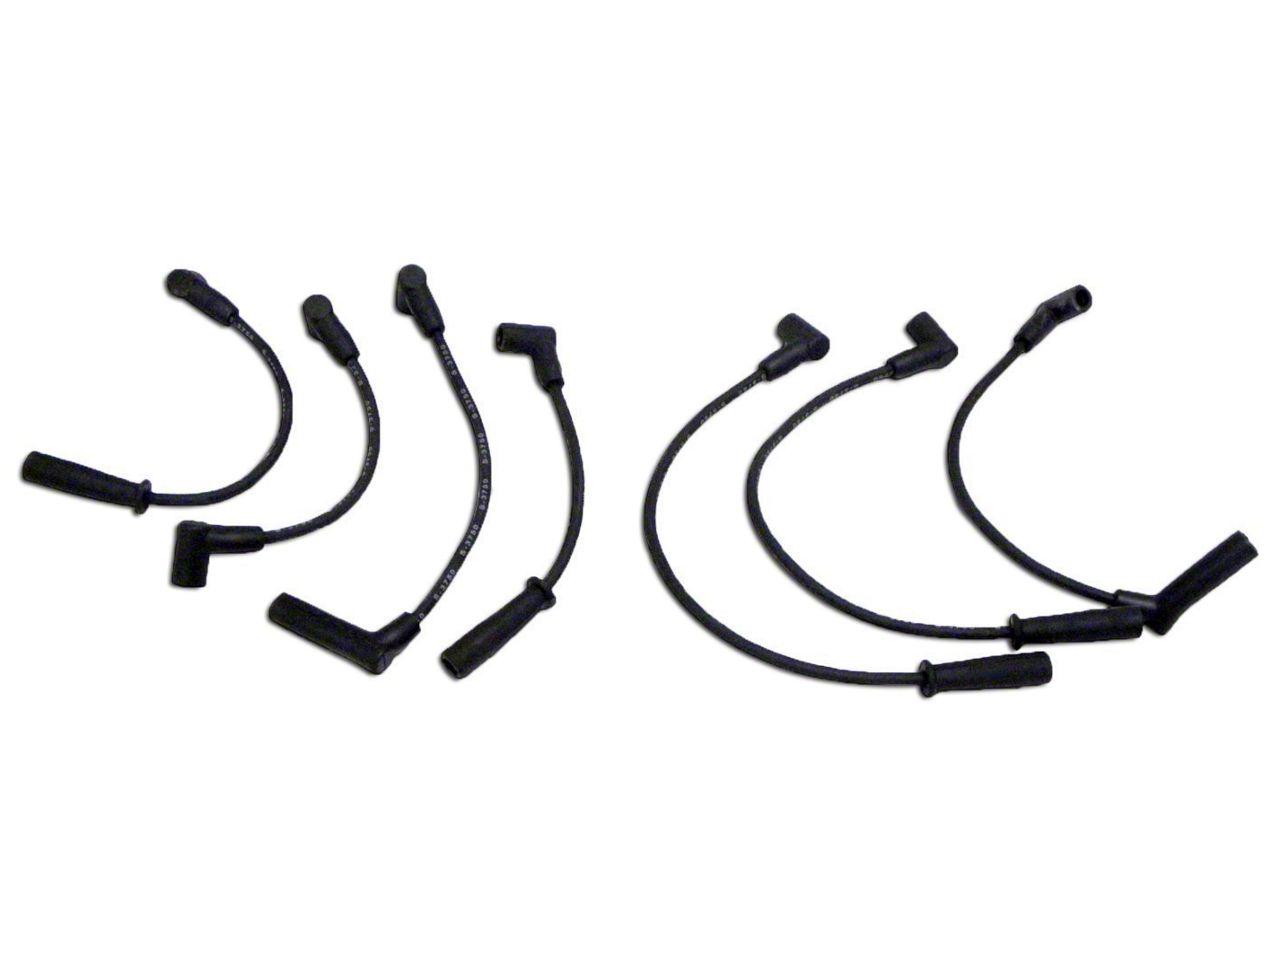 Omix-ADA Ignition Wire Set (91-99 4.0L Jeep Wrangler YJ & TJ)